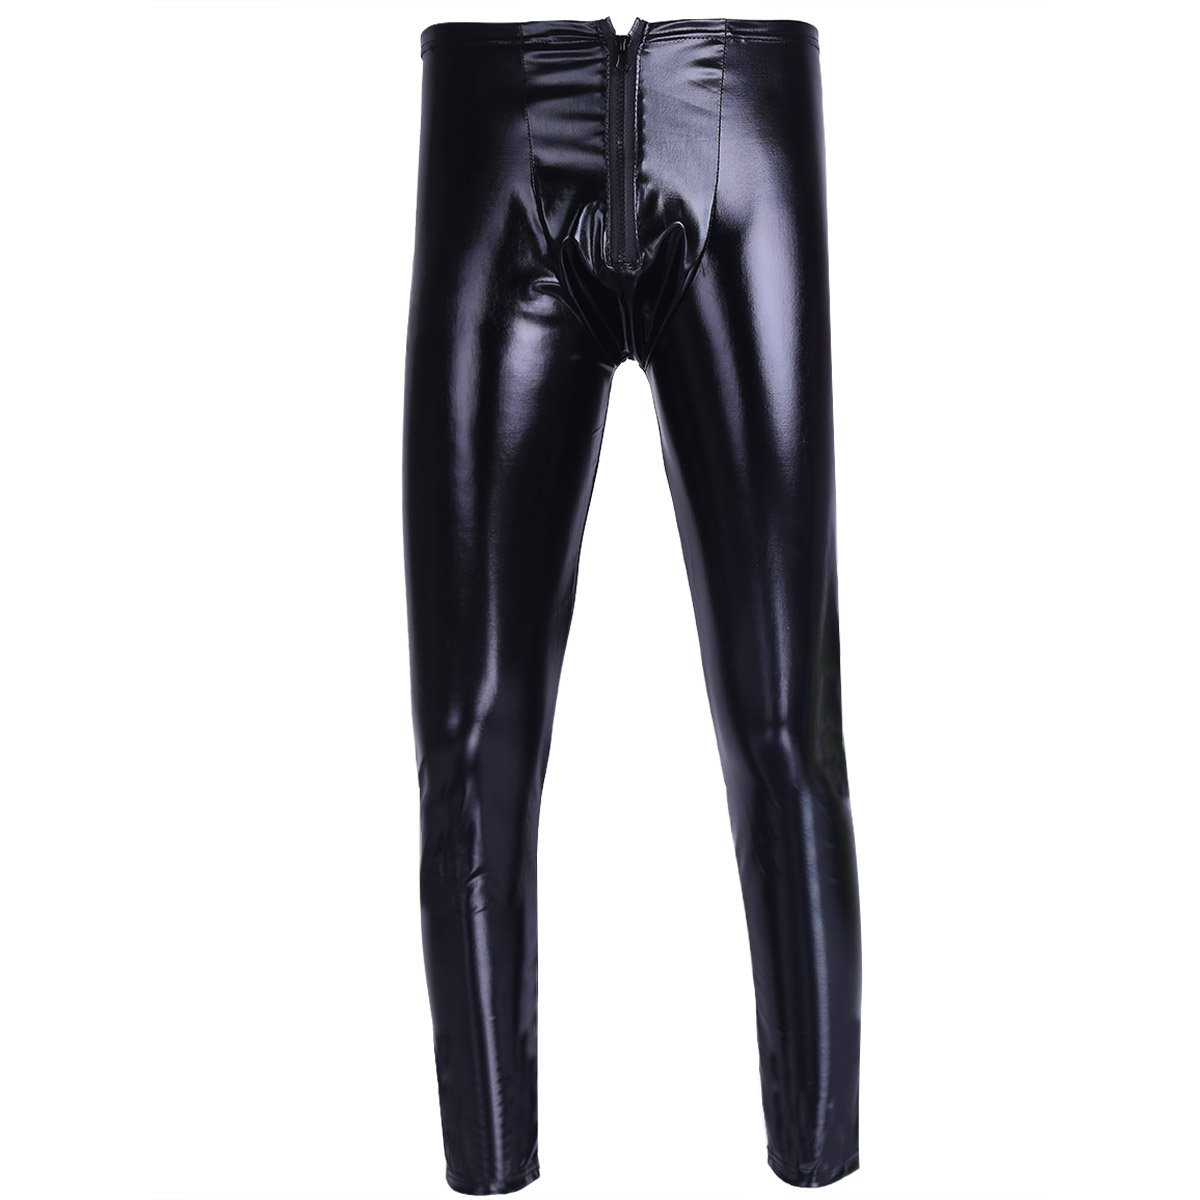 iEFiEL Herren Strumpfhosen Wetlook Glanz Lack-Optik schwarz Leggings Enge Hosen Unterw/äsche Pants